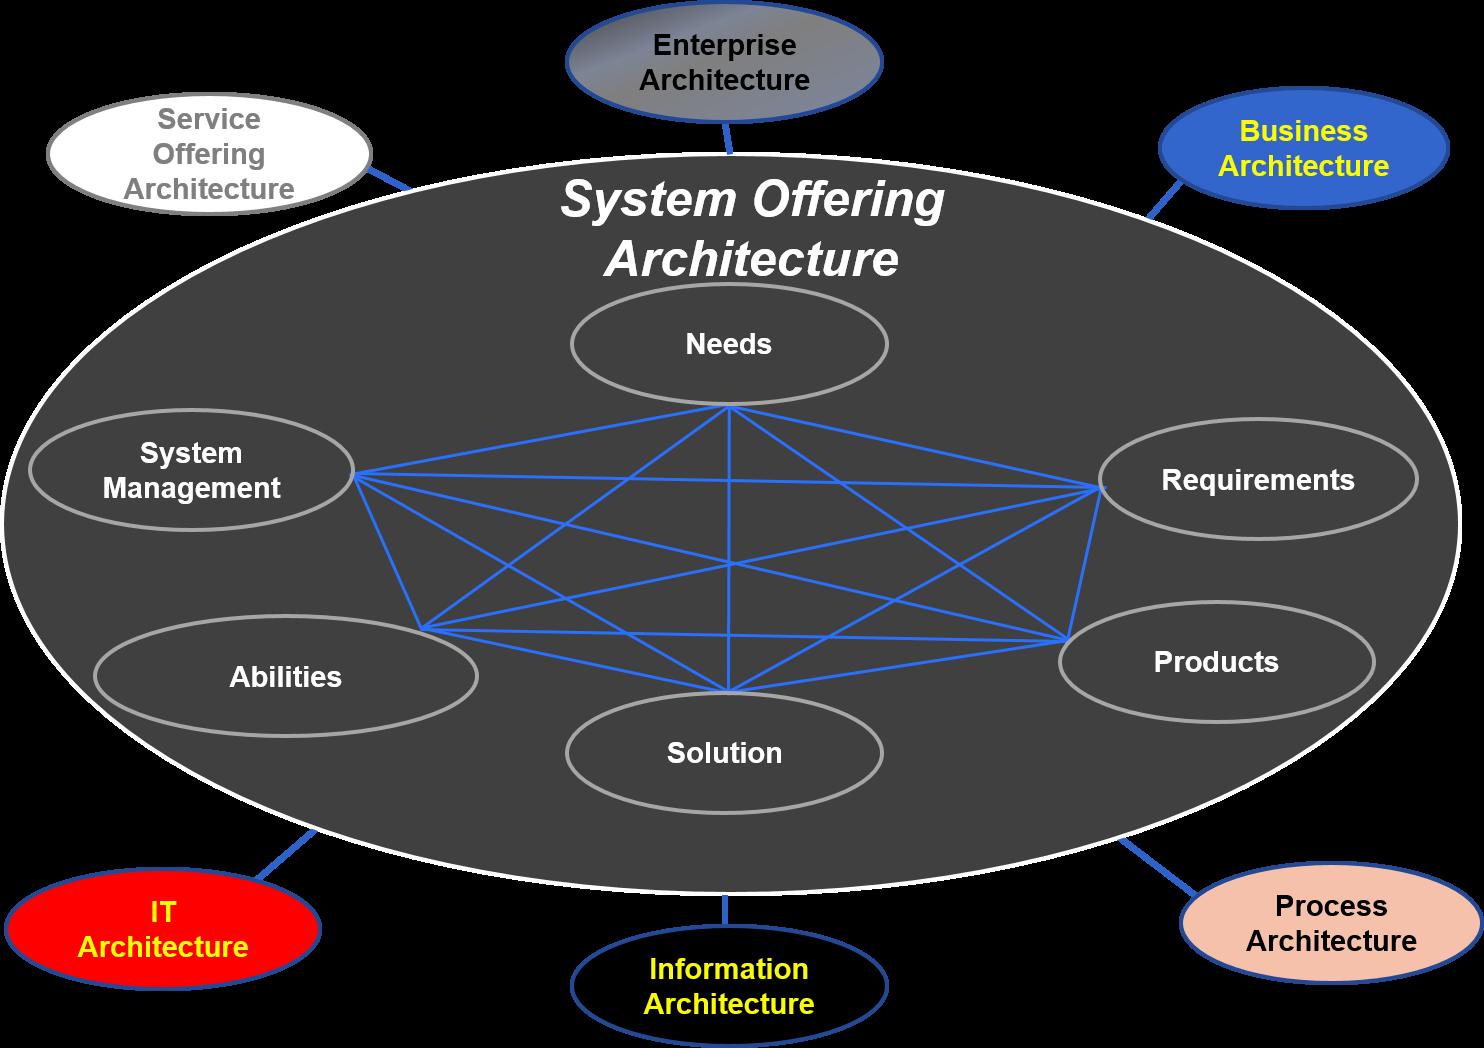 SysArchitecture